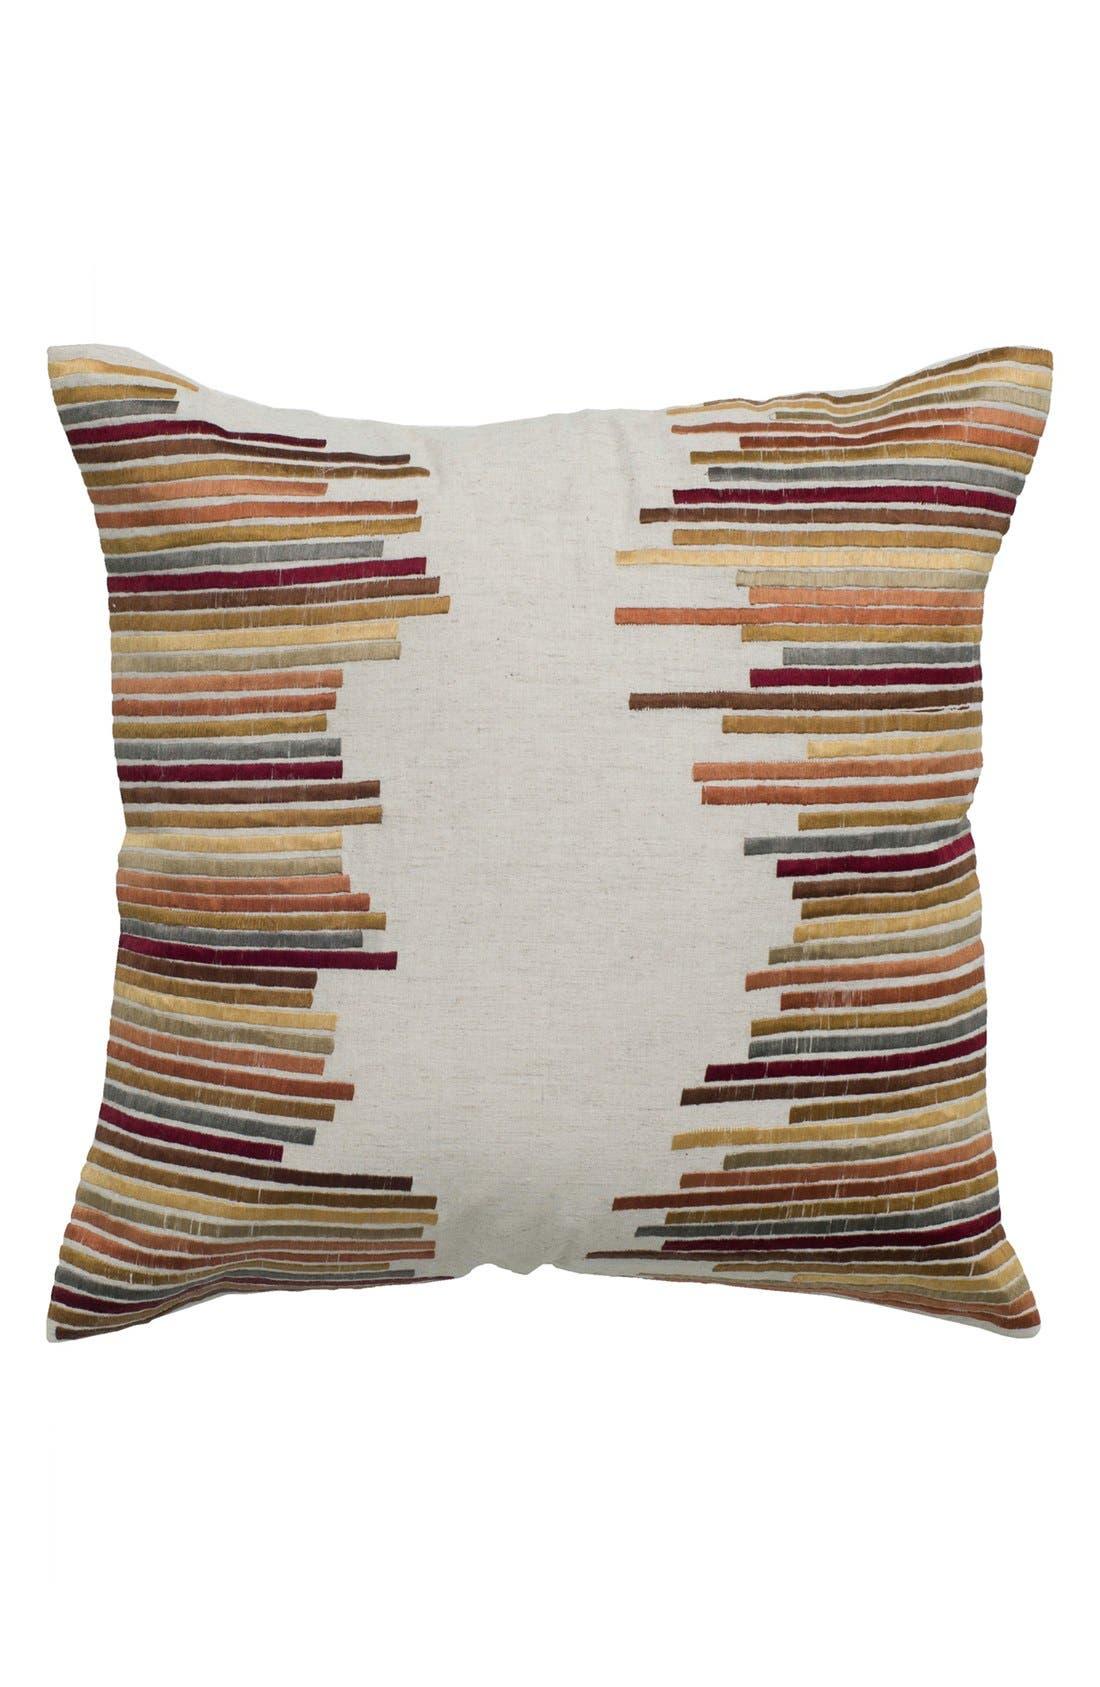 'Jagged Stripe' Pillow,                         Main,                         color, Beige/ Khaki